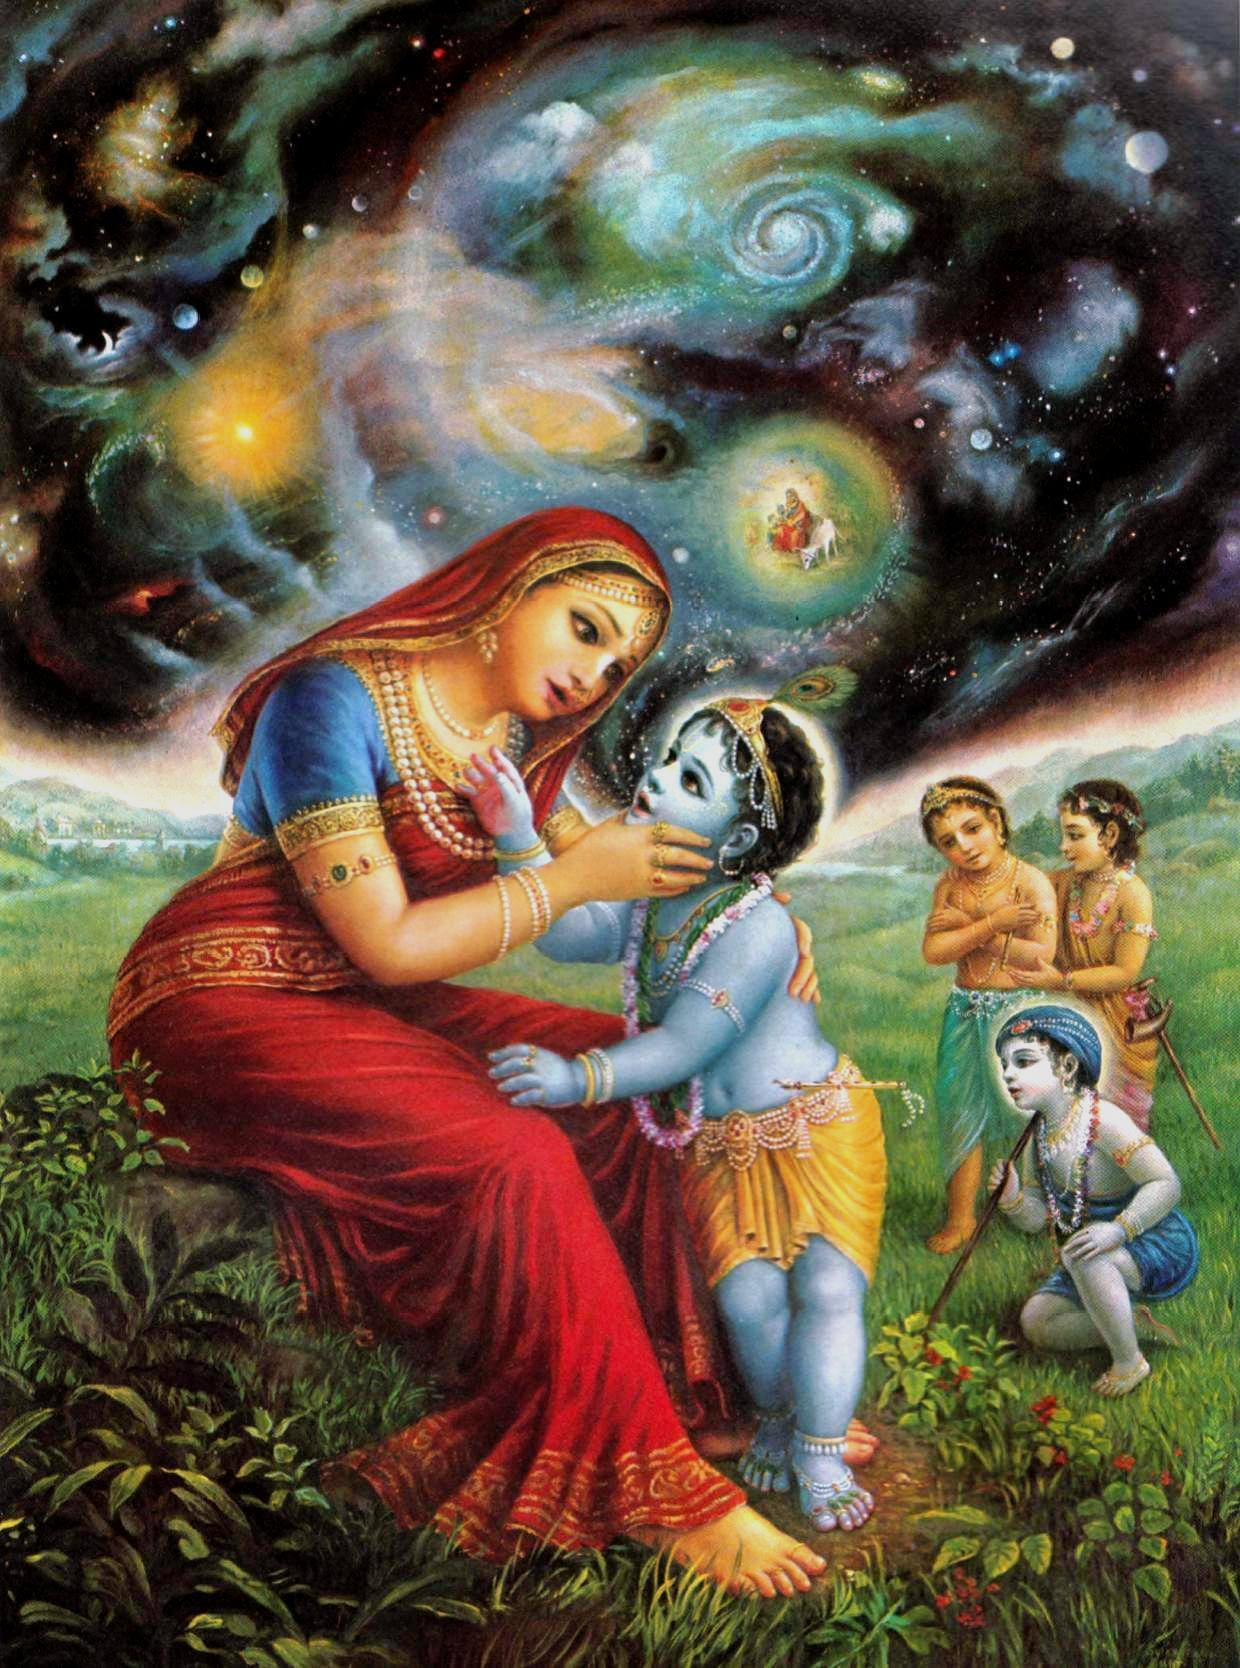 Uncategorized beautiful radha krishna hd wallpaper shri krishna and radha rani beautiful lighting effects hd wallpaper - Krishna Eating Dirt